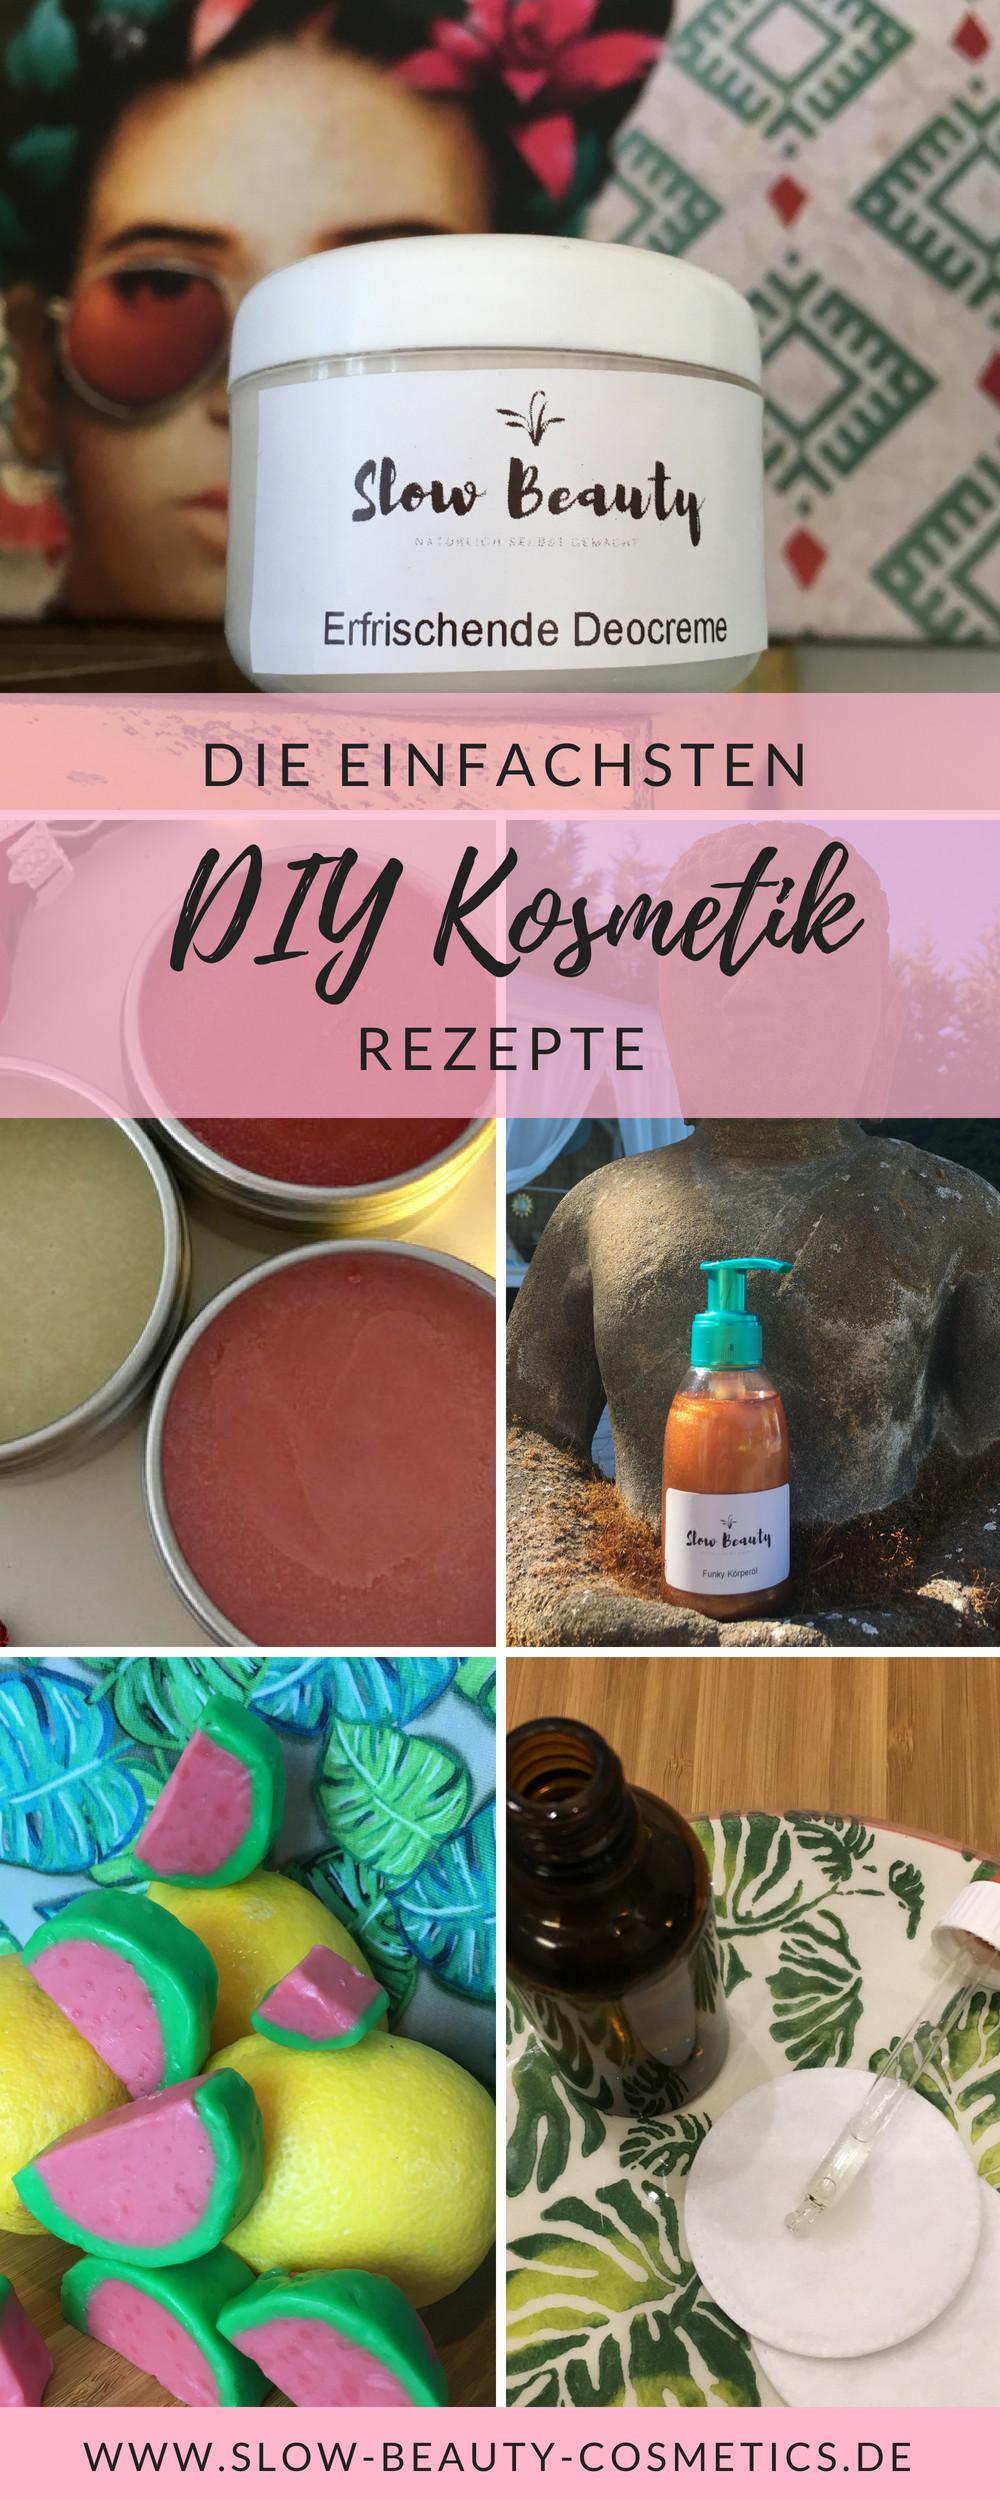 Diy Kosmetik  DIY Naturkosmetik Rezepte